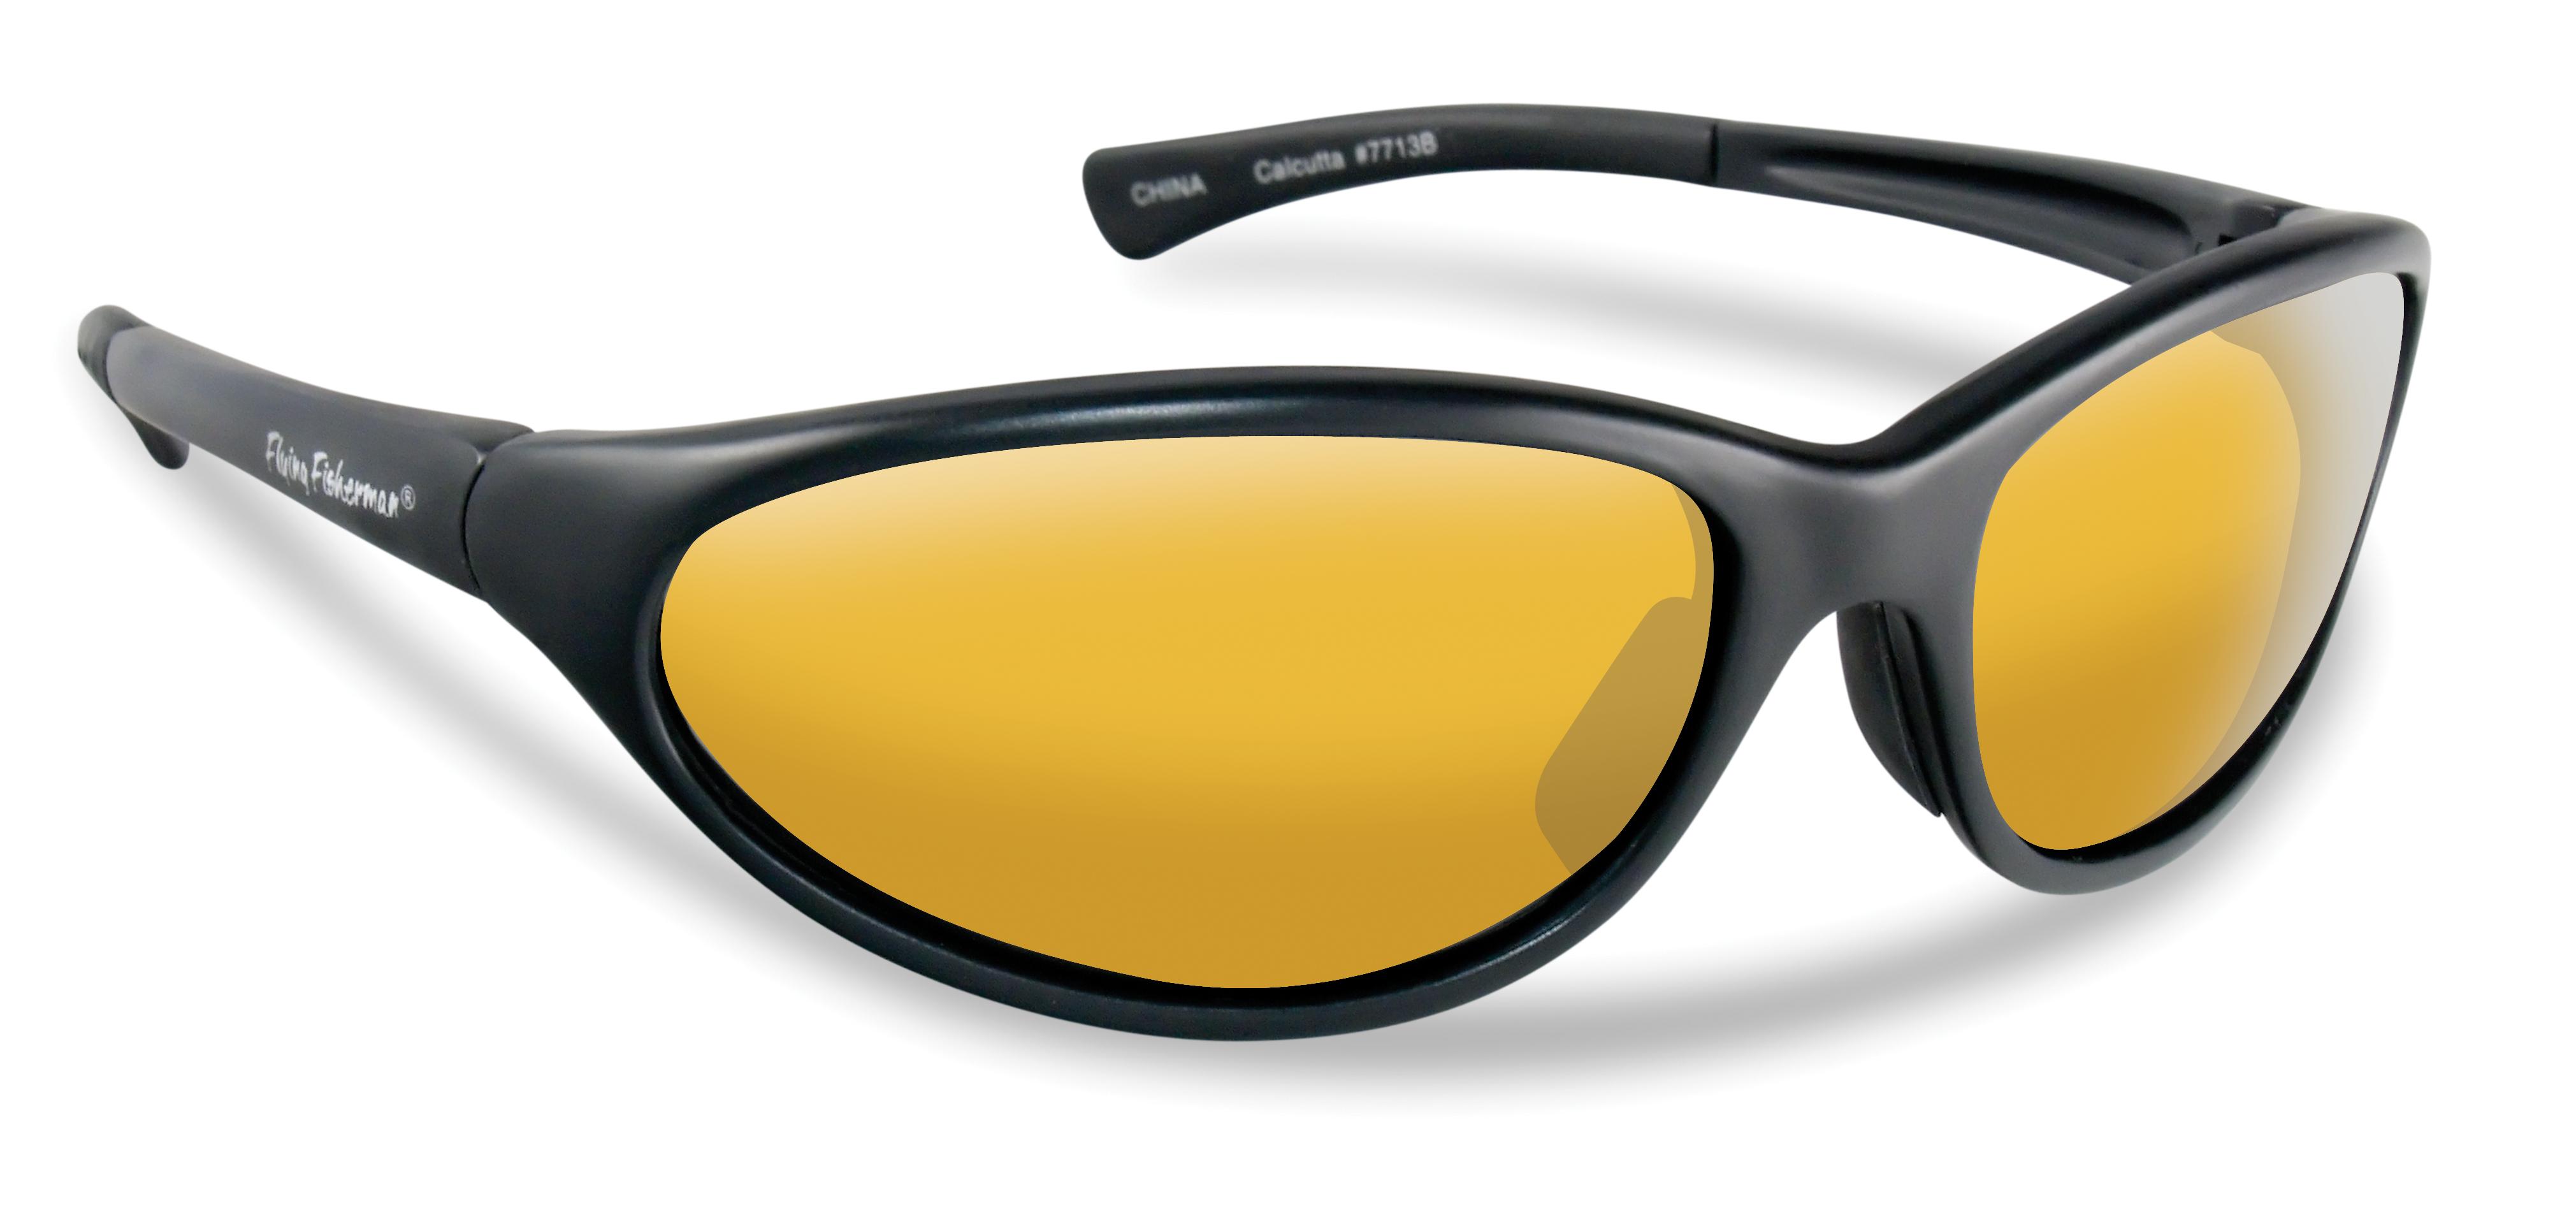 f0cd3d5d68 Flying Fisherman Calcutta Sunglasses – Glasgow Angling Centre